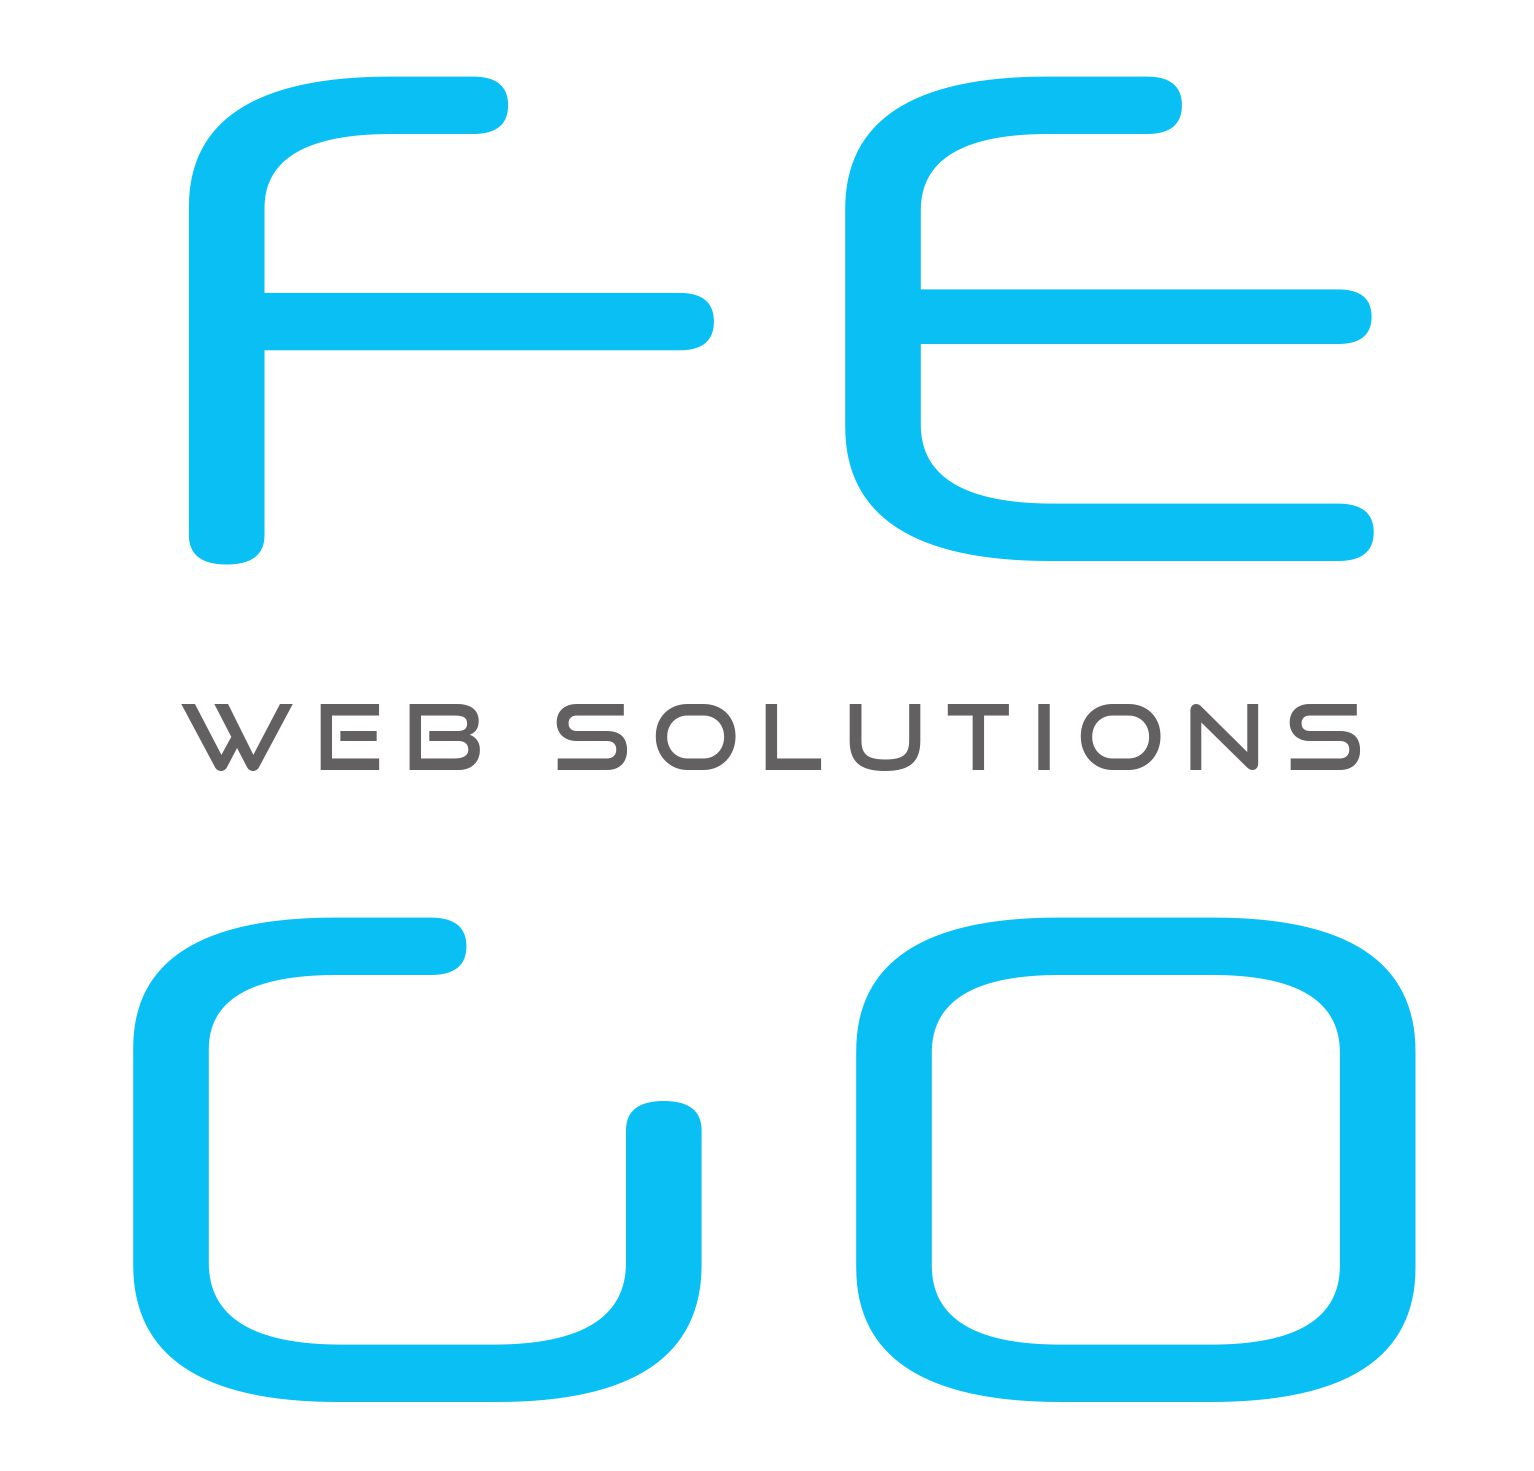 FEGO Web Solutions